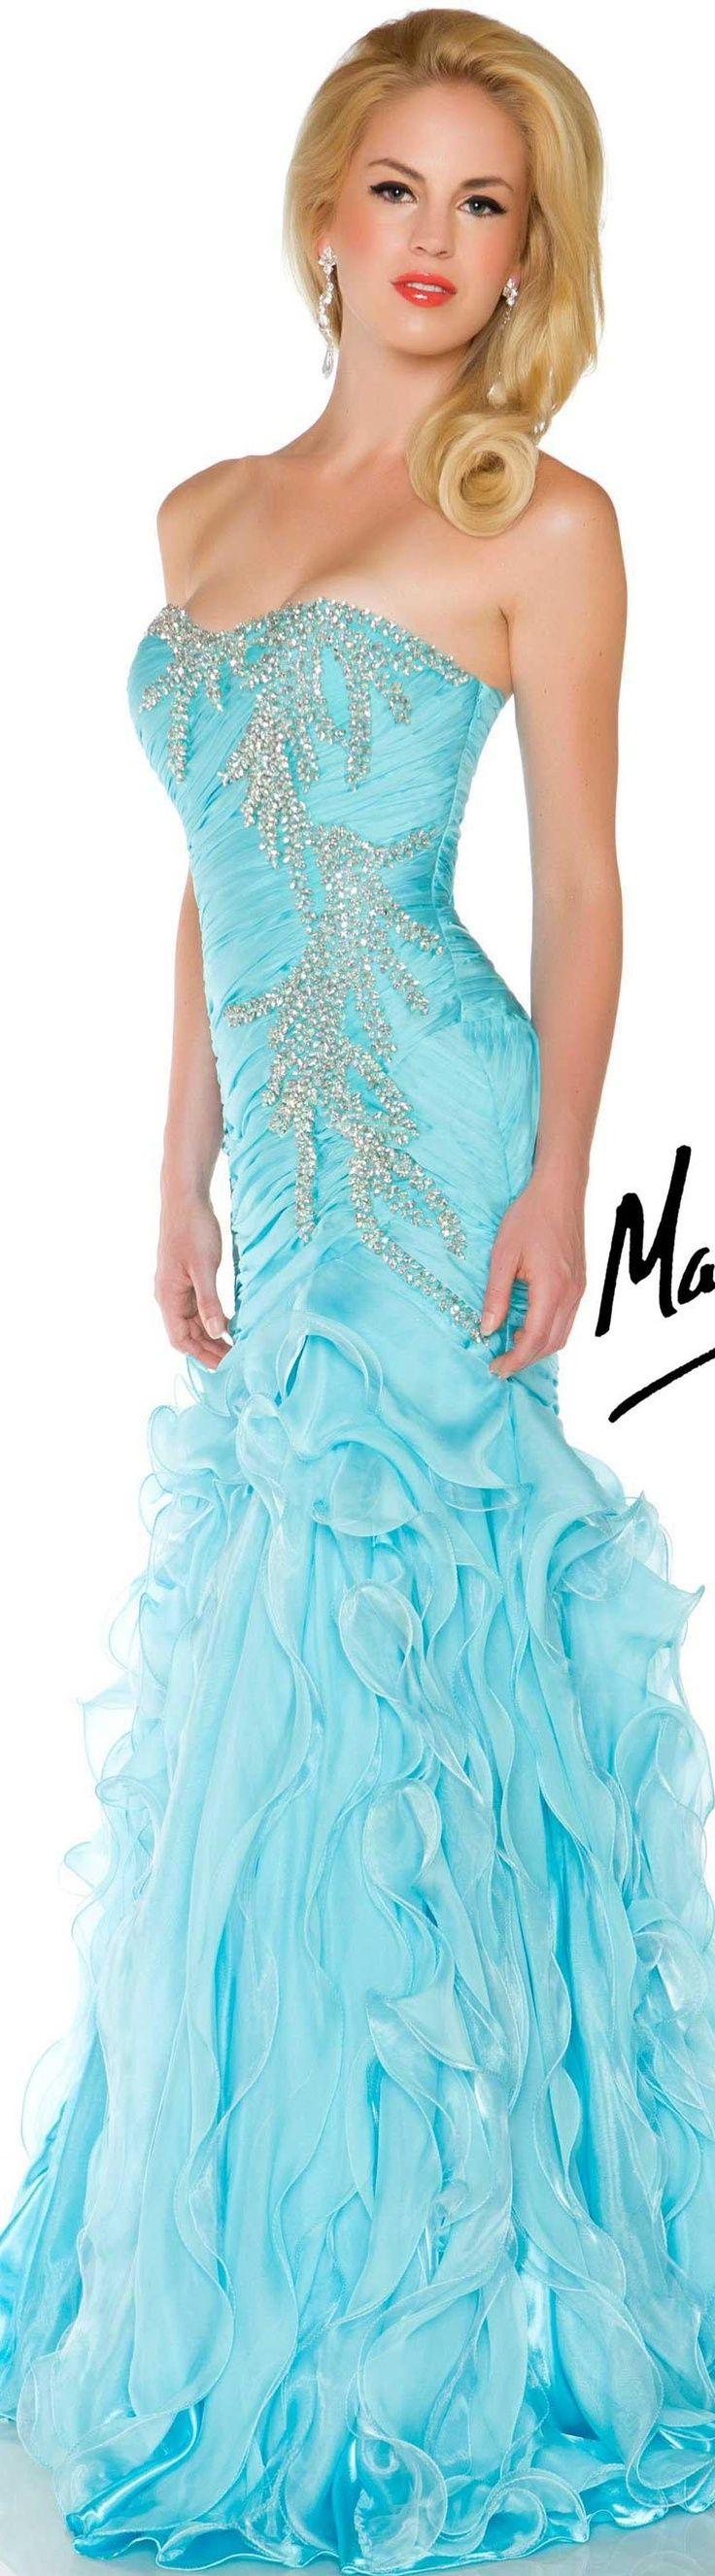 Mac duggal couture dress aqua strapless glitter long dress